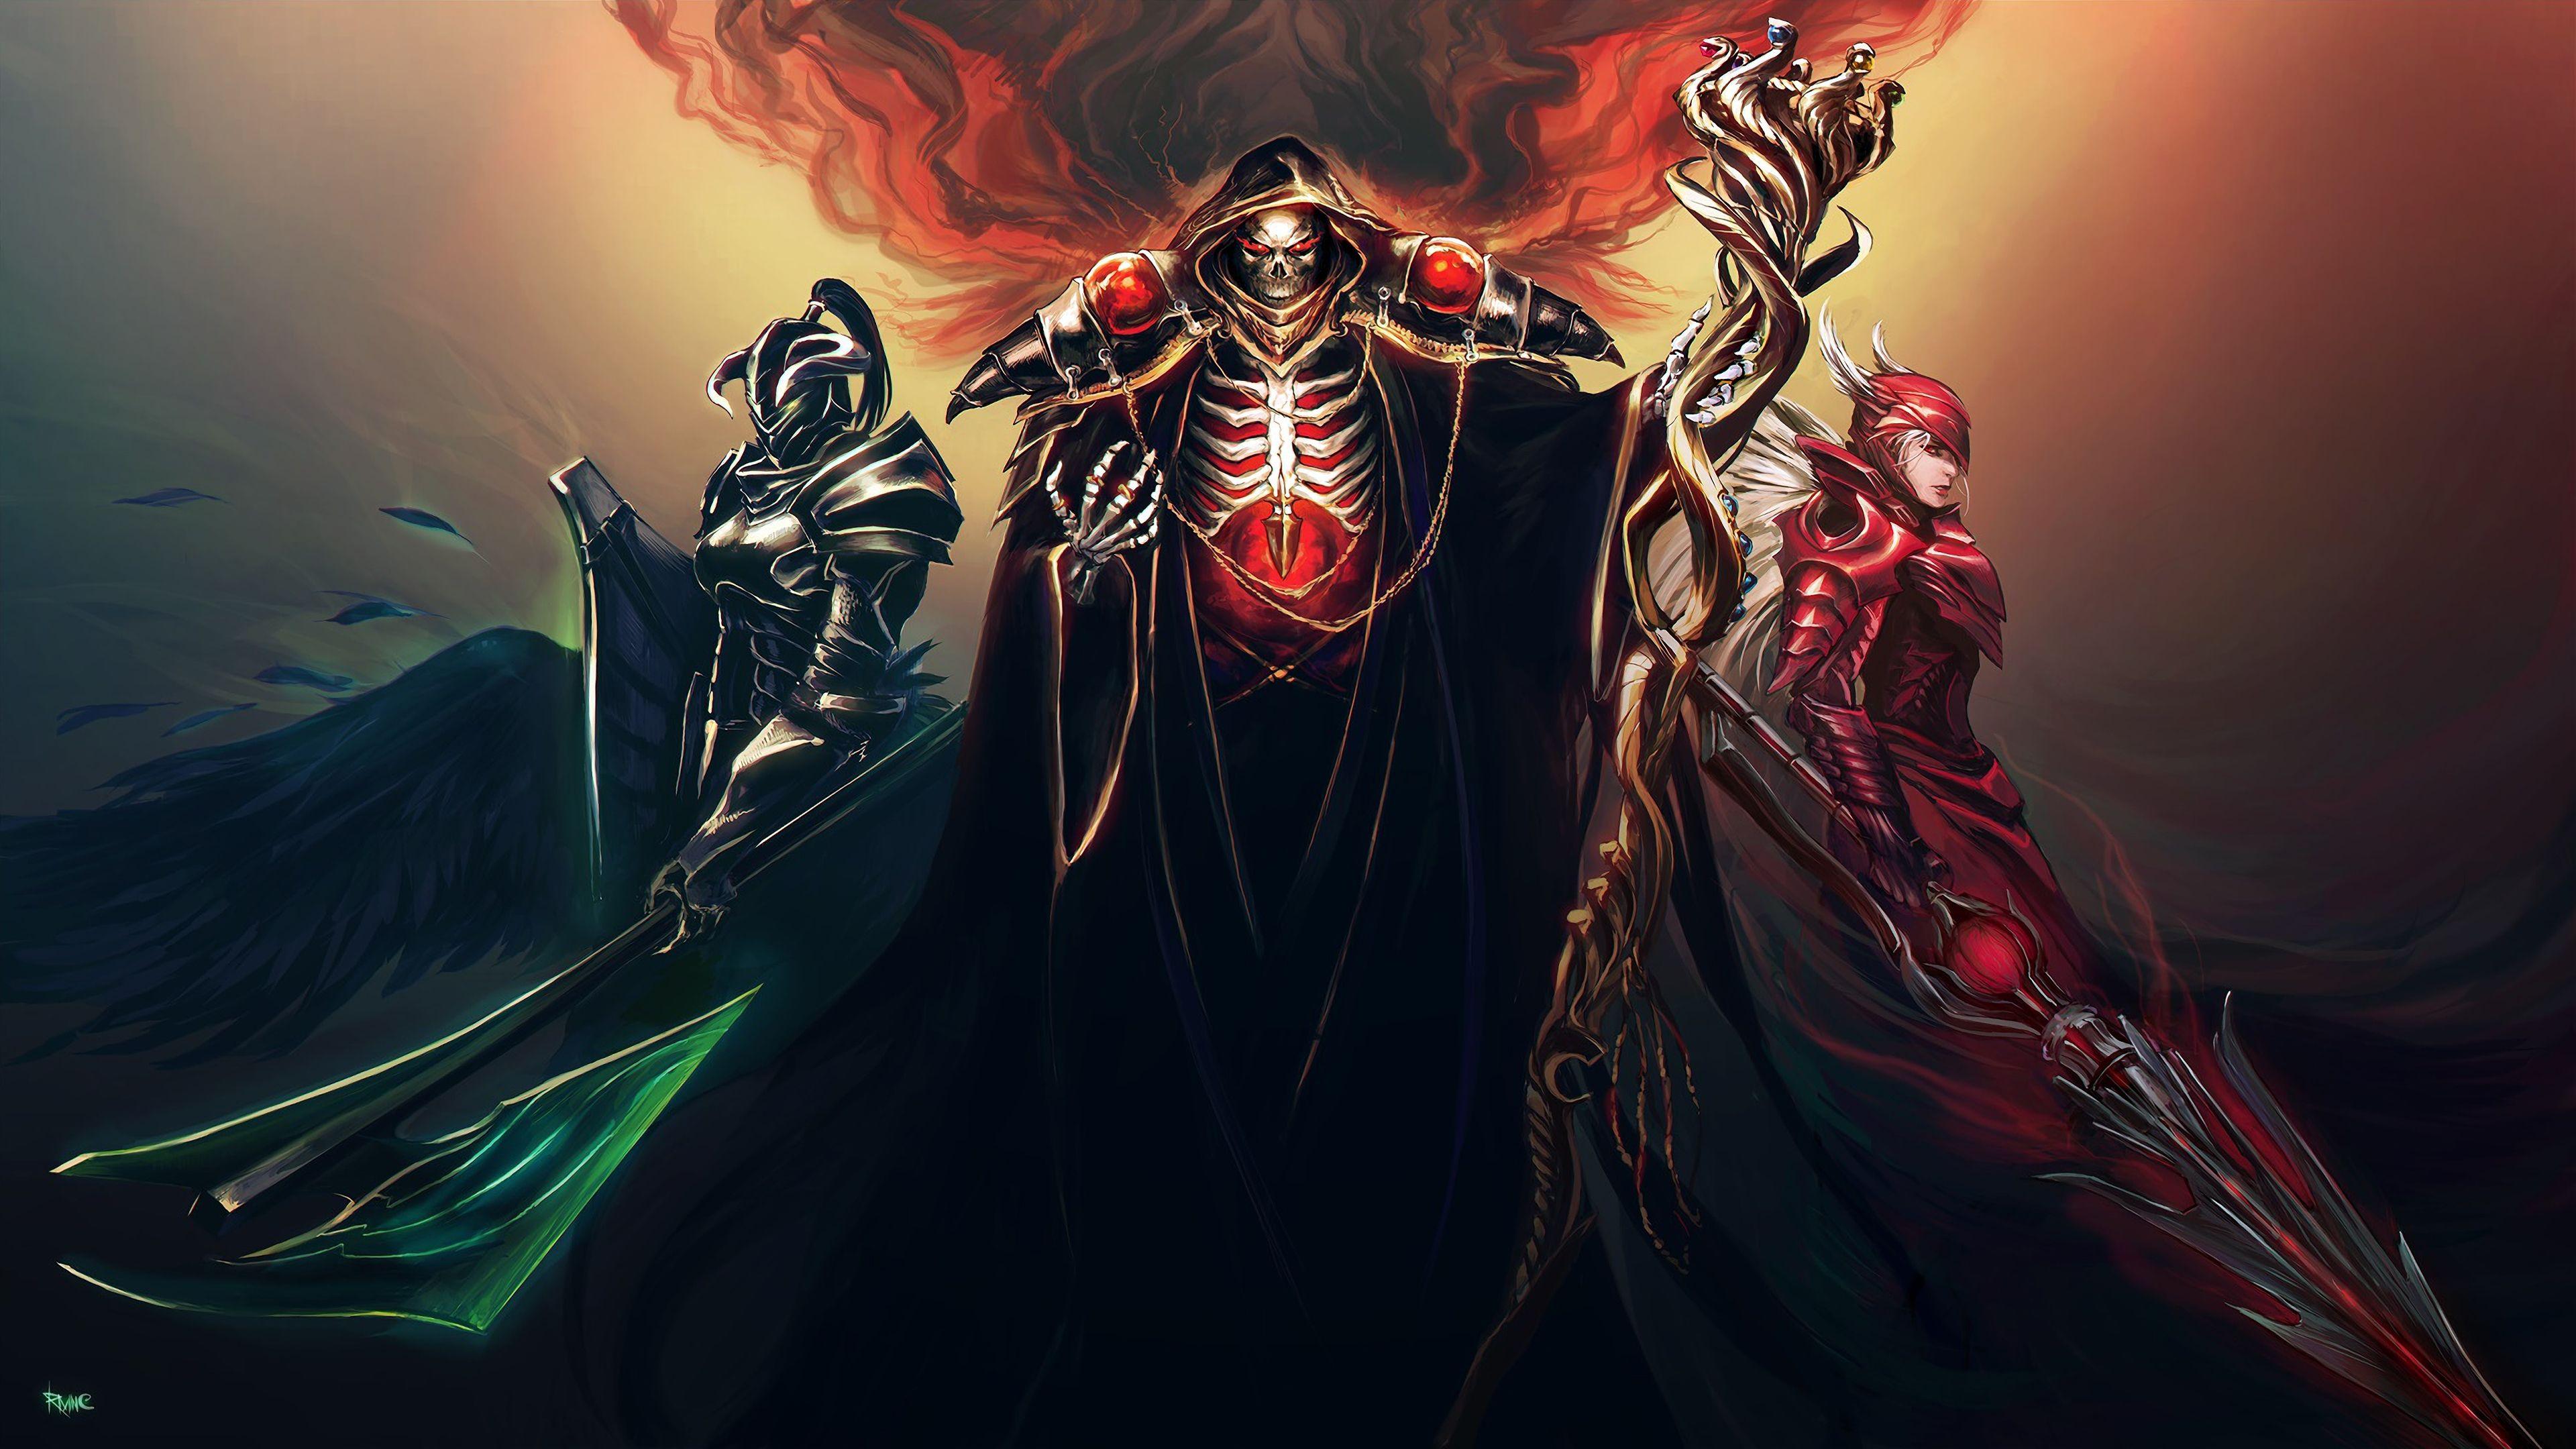 Overlord Anime Ainz Ooal Gown Albedo Shalltear Bloodfallen Knight 3840x2160 Wallpaper Albedo Anime Anime Fanart 10 overlord anime wallpaper